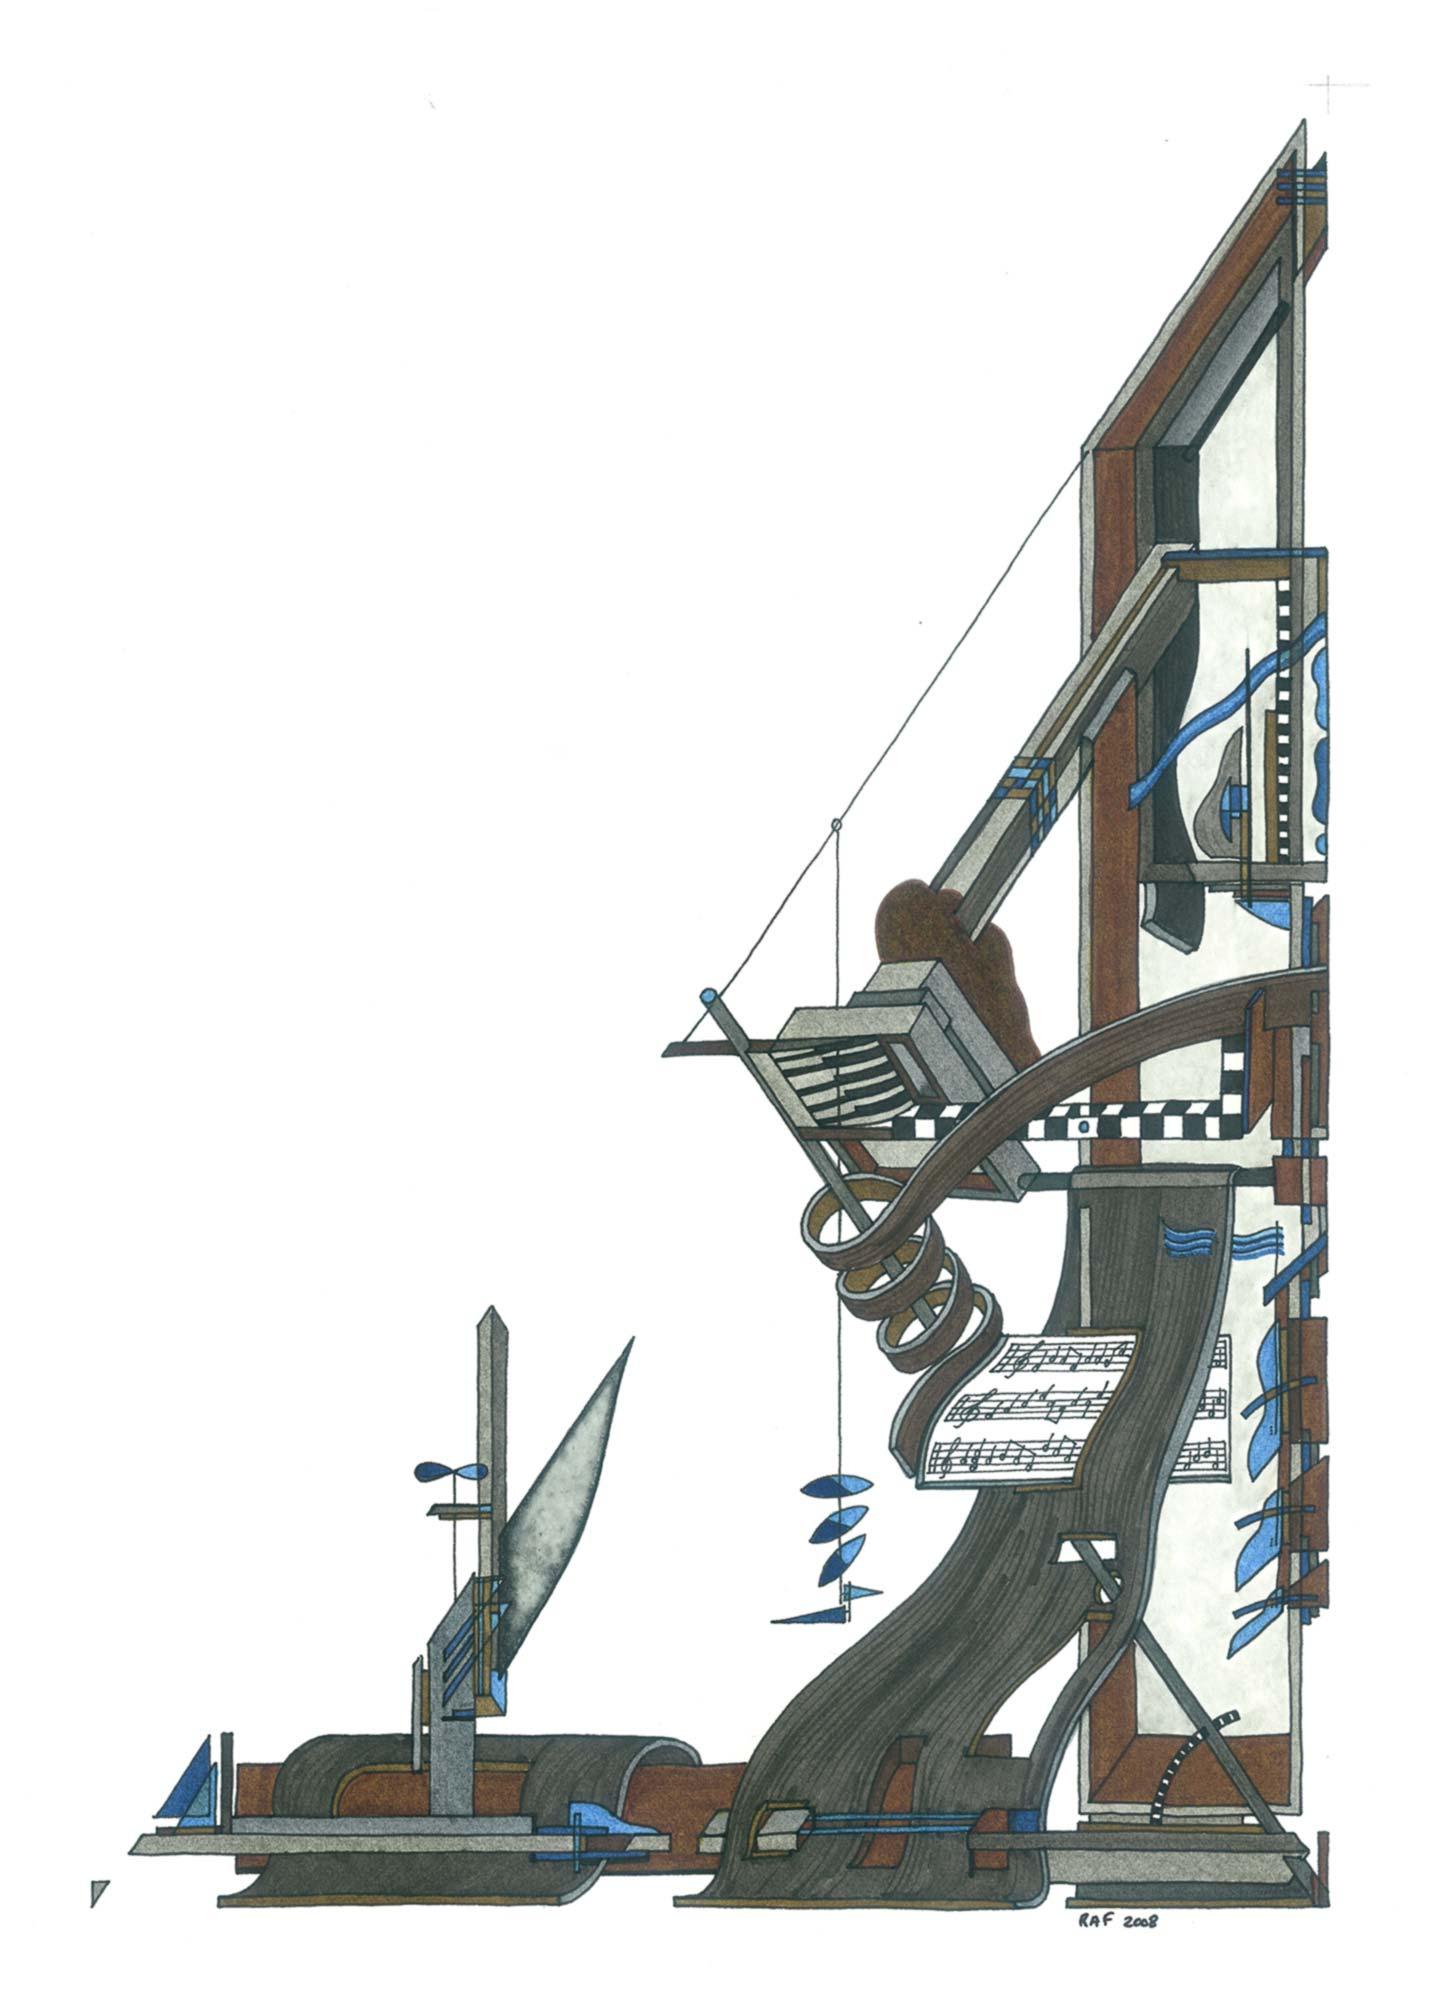 La machine à bach, dessin, Raf Listowski, 2008